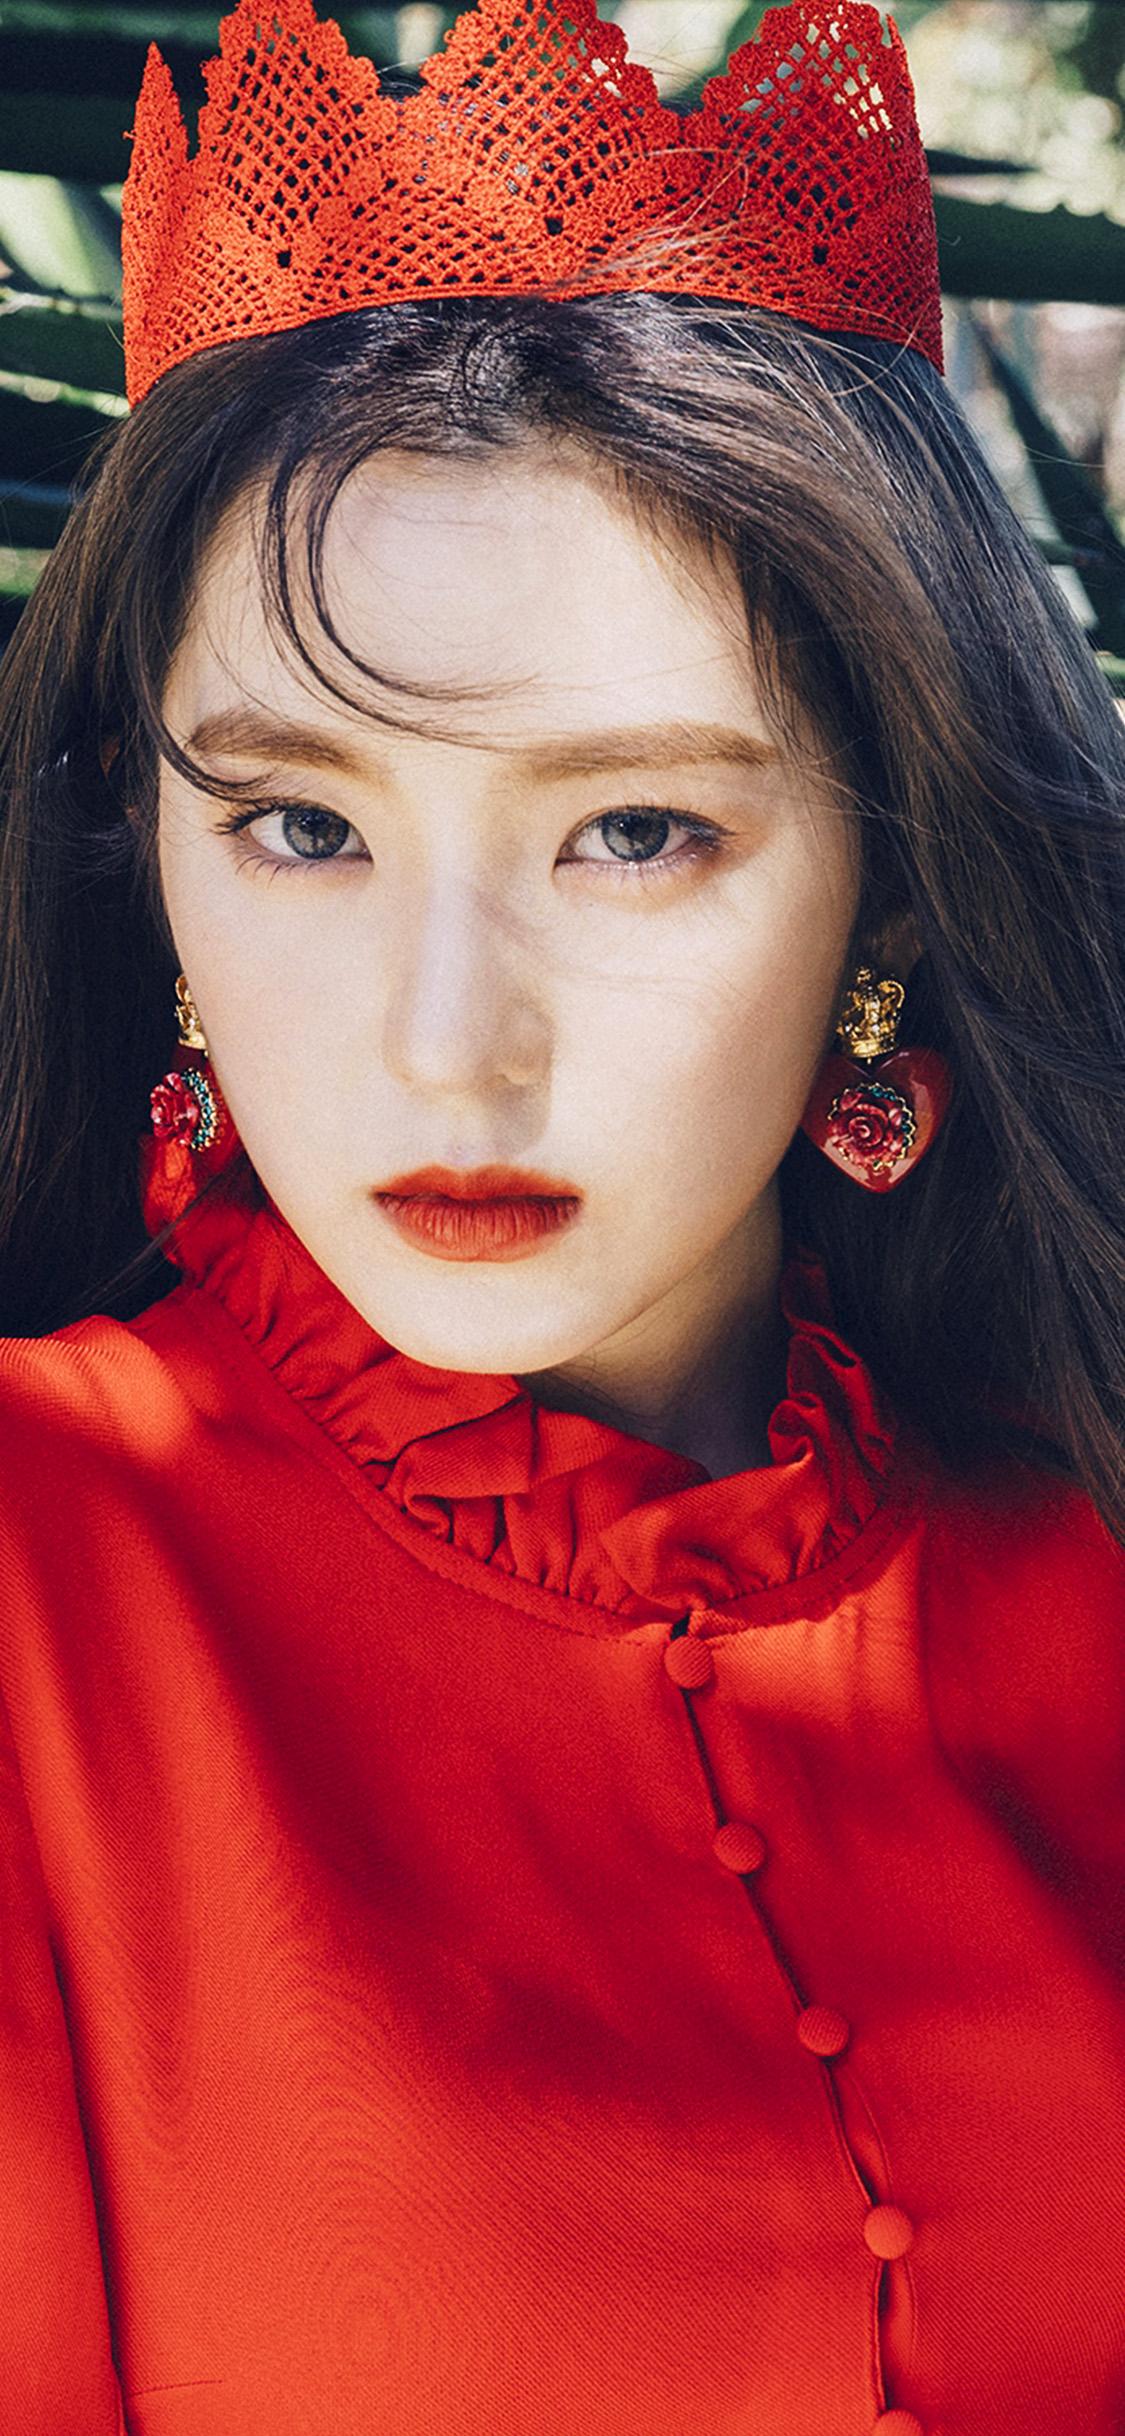 Iphonexpapers Com Iphone X Wallpaper Ho66 Red Velvet